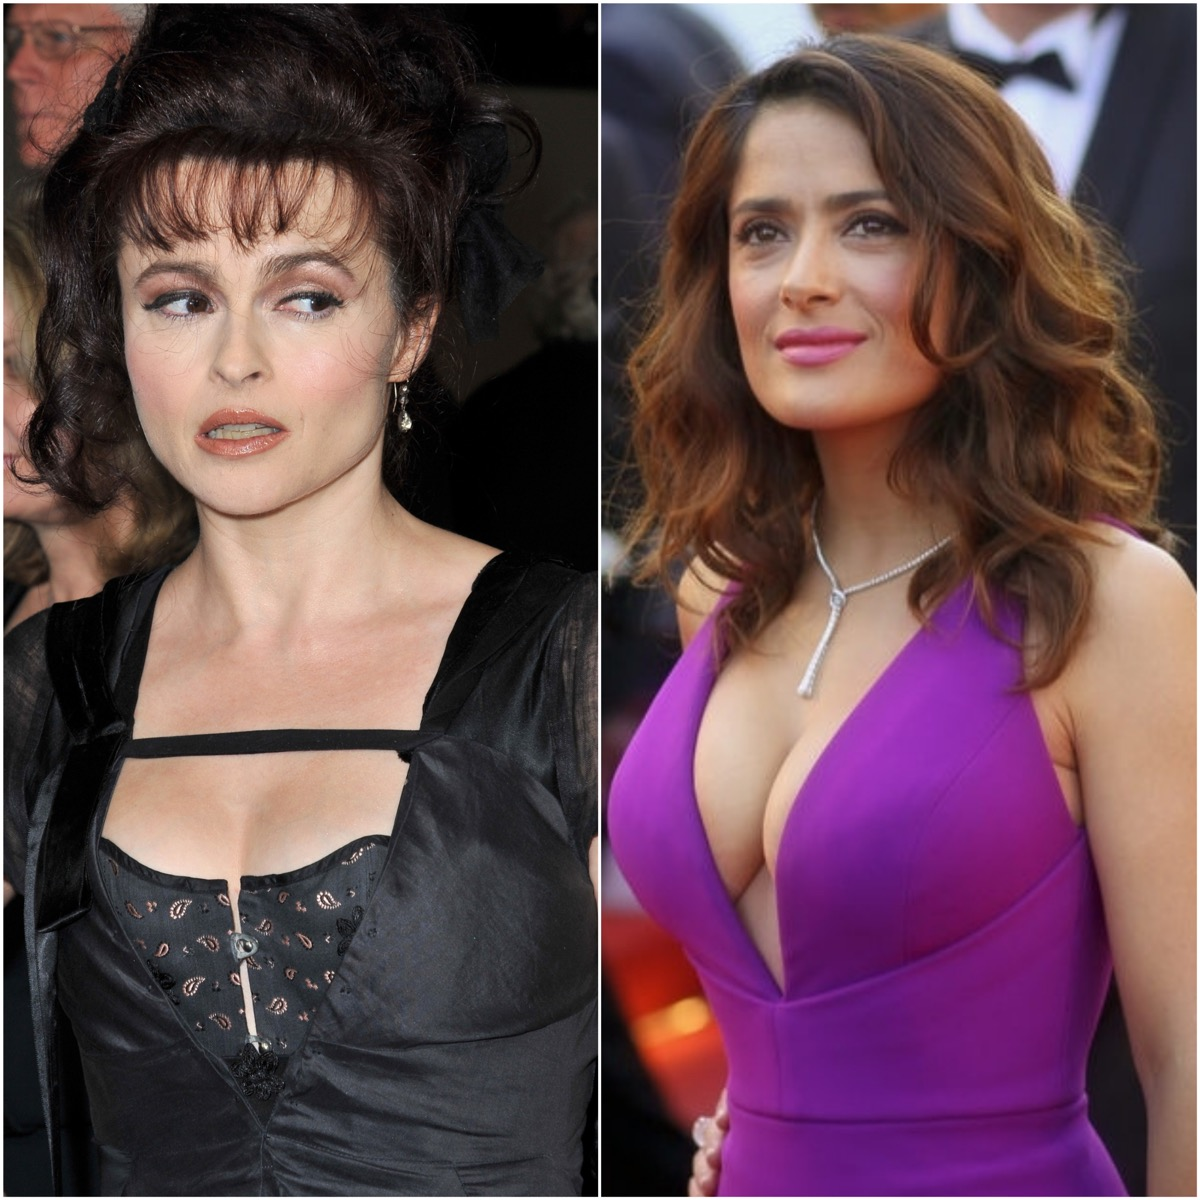 Helena Bonham Carter and Salma Hayek